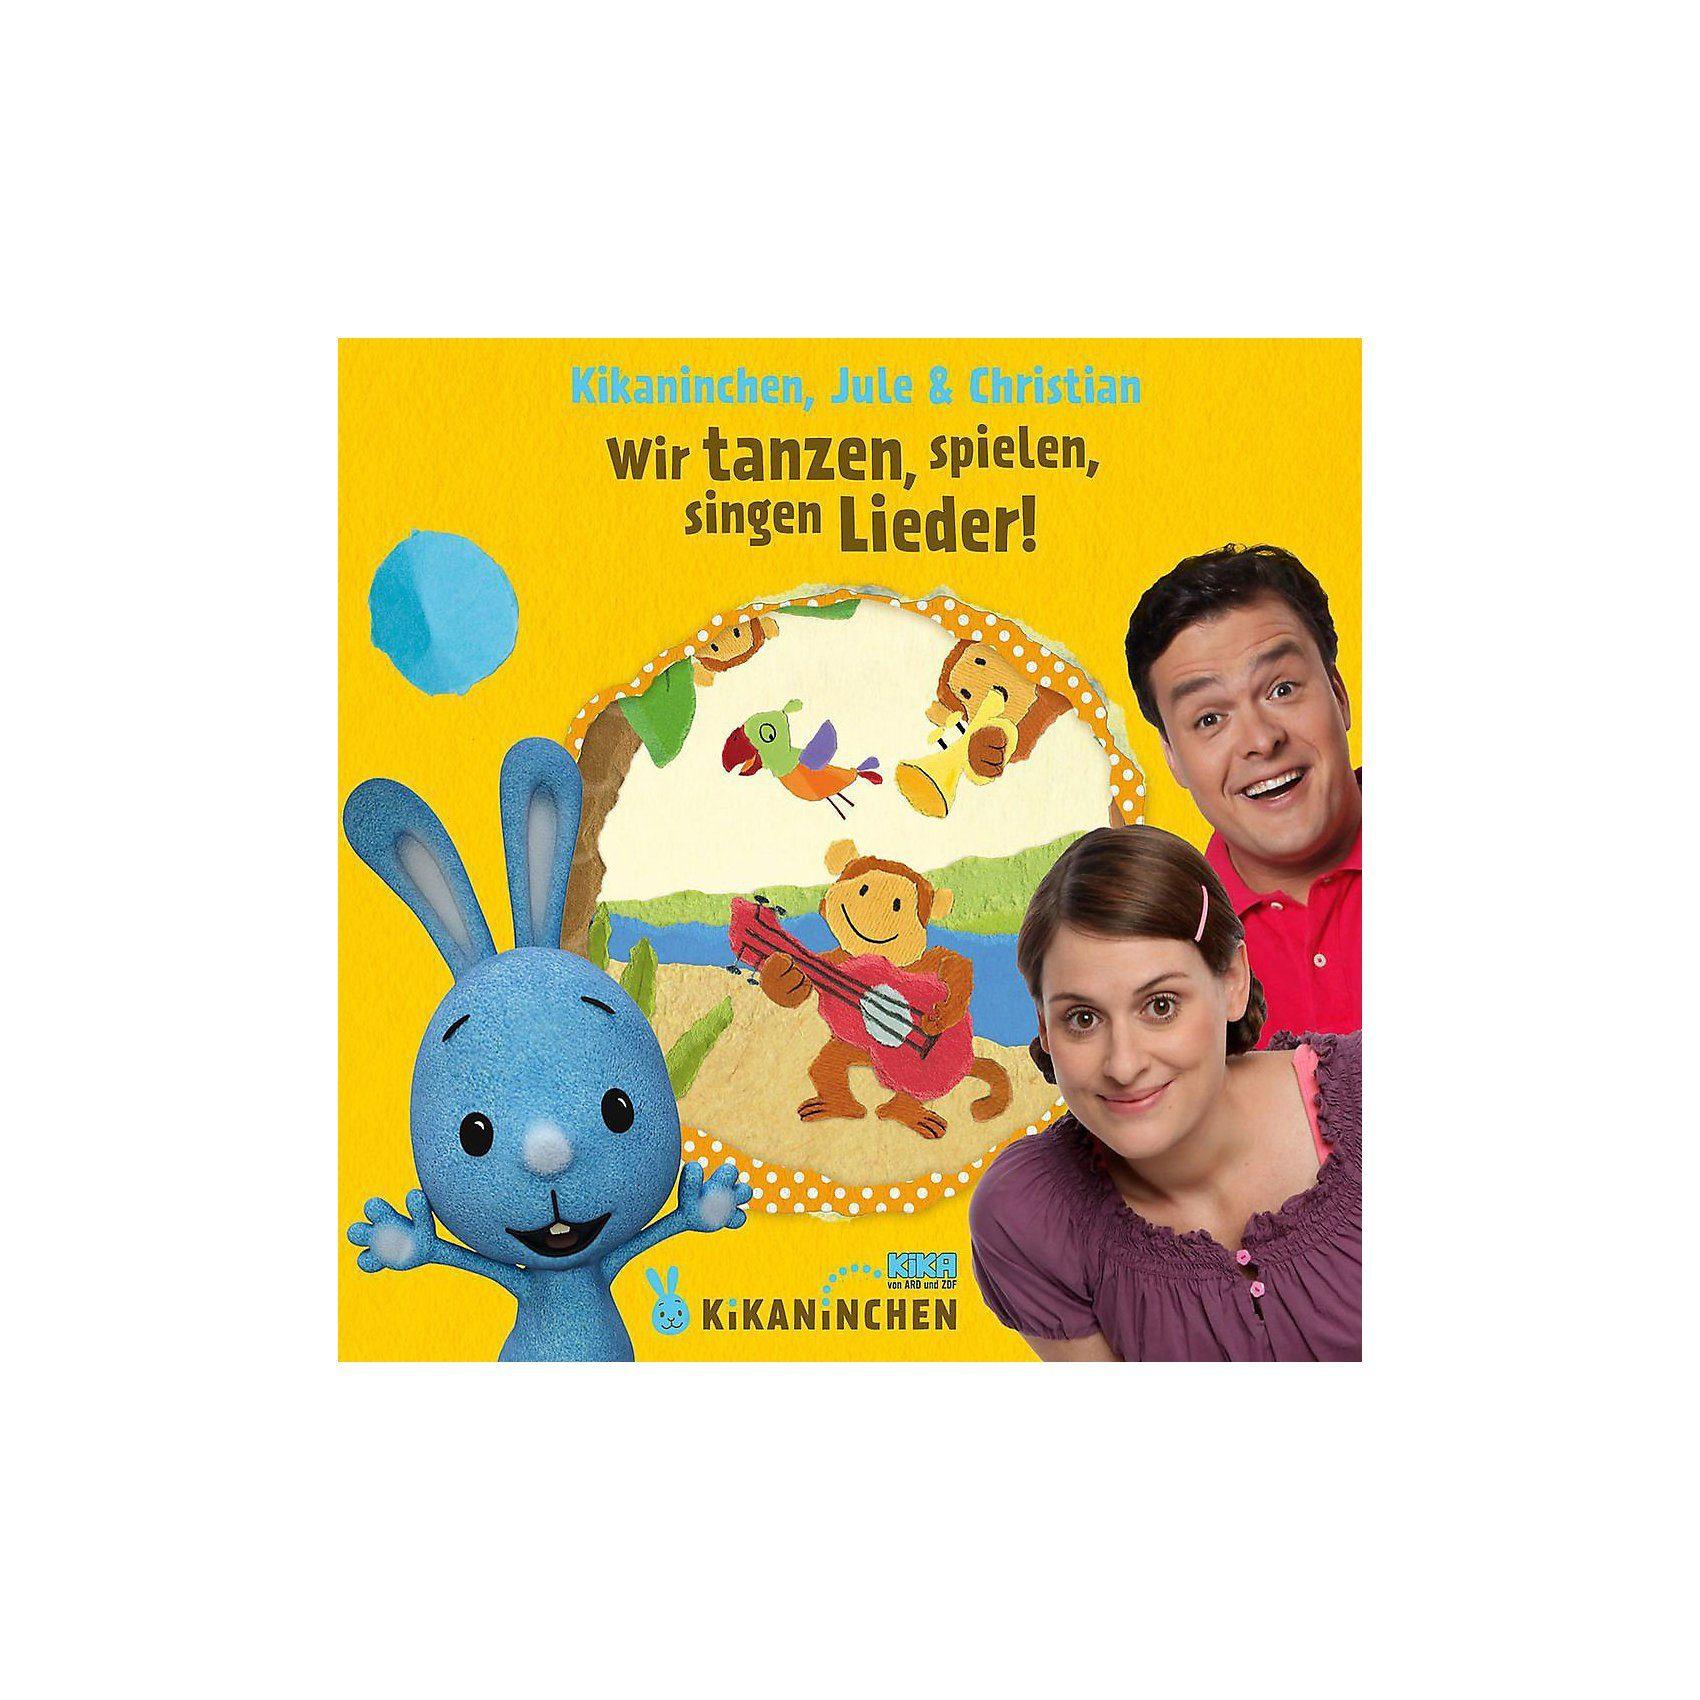 Universal CD Kikaninchen, Jule & Christian 02 - Wir Tanzen,Spielen,Sin